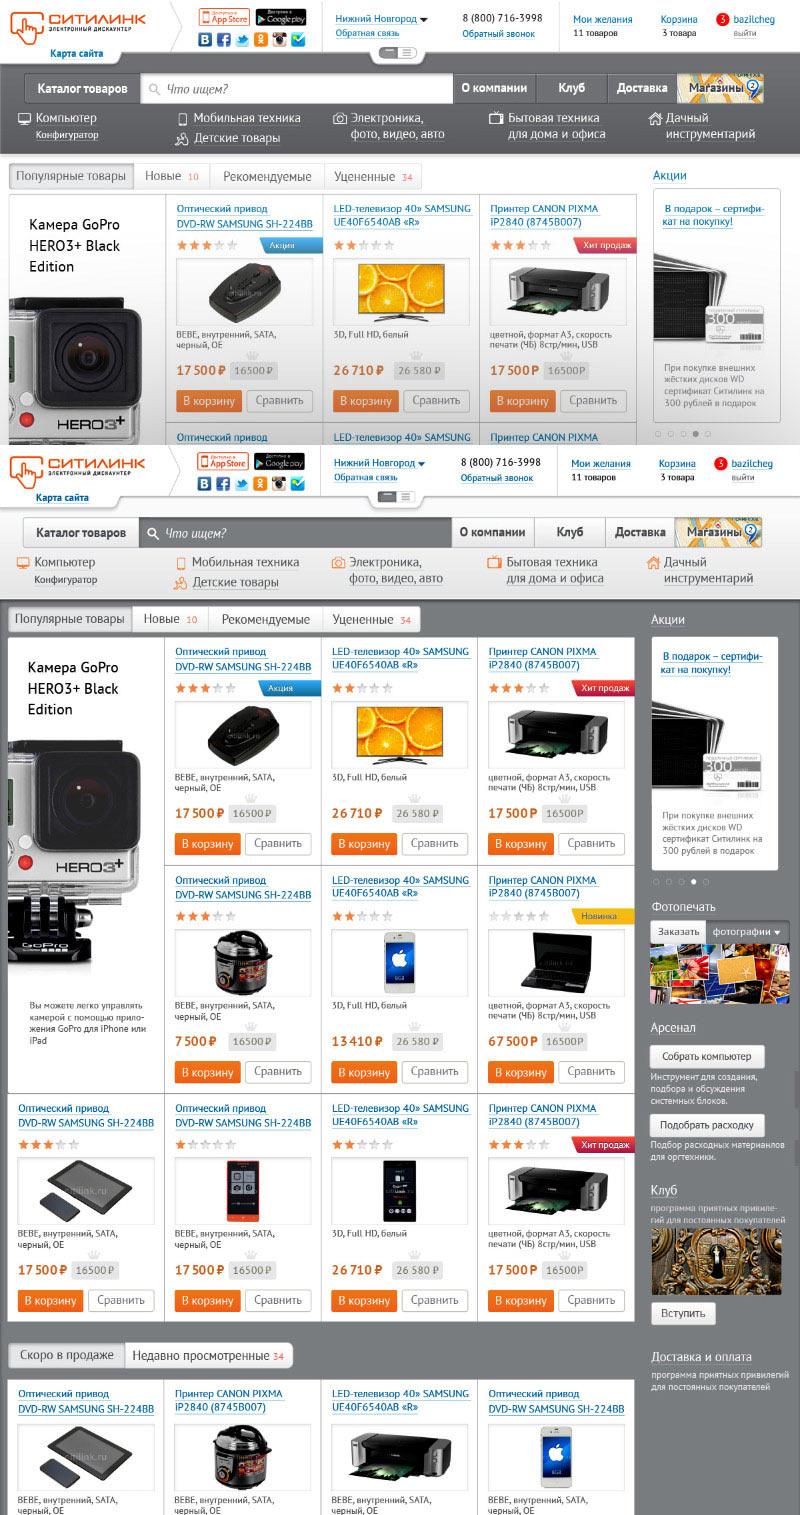 Ситилинк Шахты Каталог Товаров Интернет Магазин